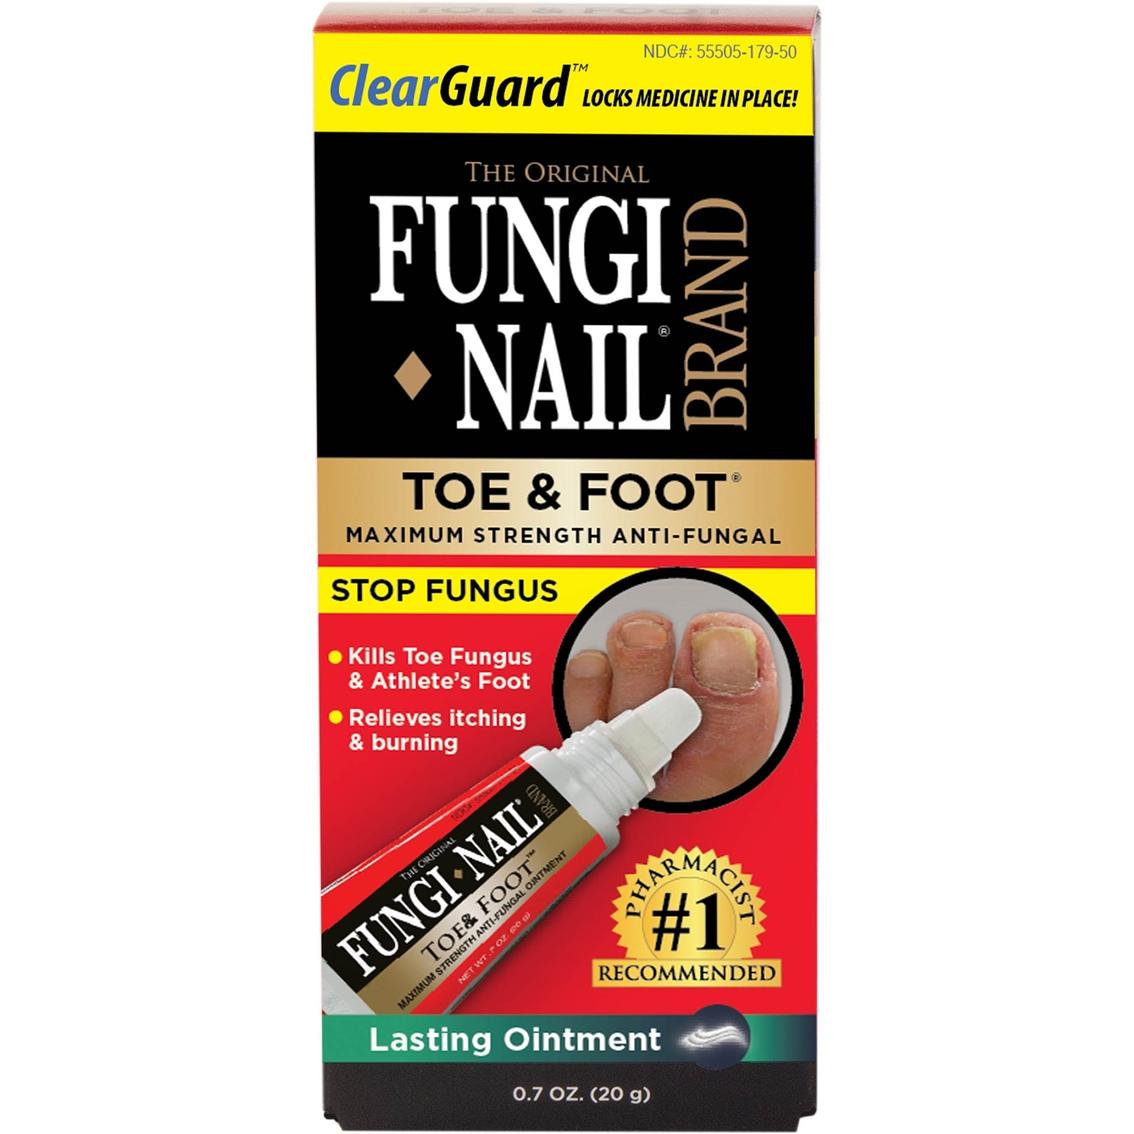 Fungi-nail Toe & Foot Anti-fungal Ointment | Foot Care | Beauty ...